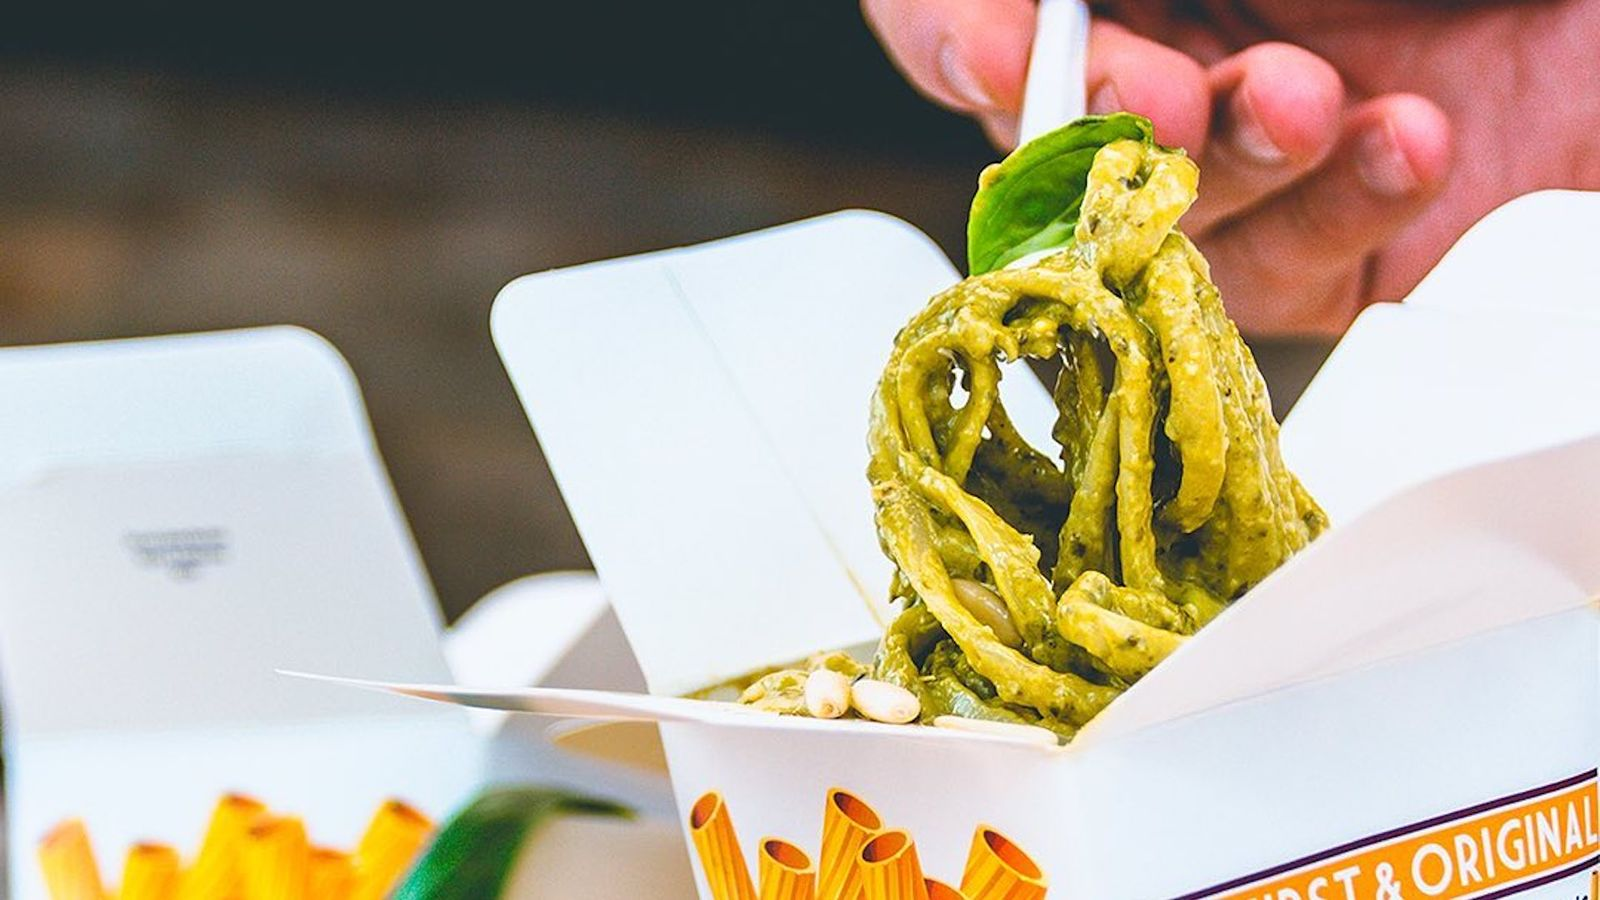 DalMoros Fresh Pasta To Go Opening In St. Petersburg, Florida This Spring